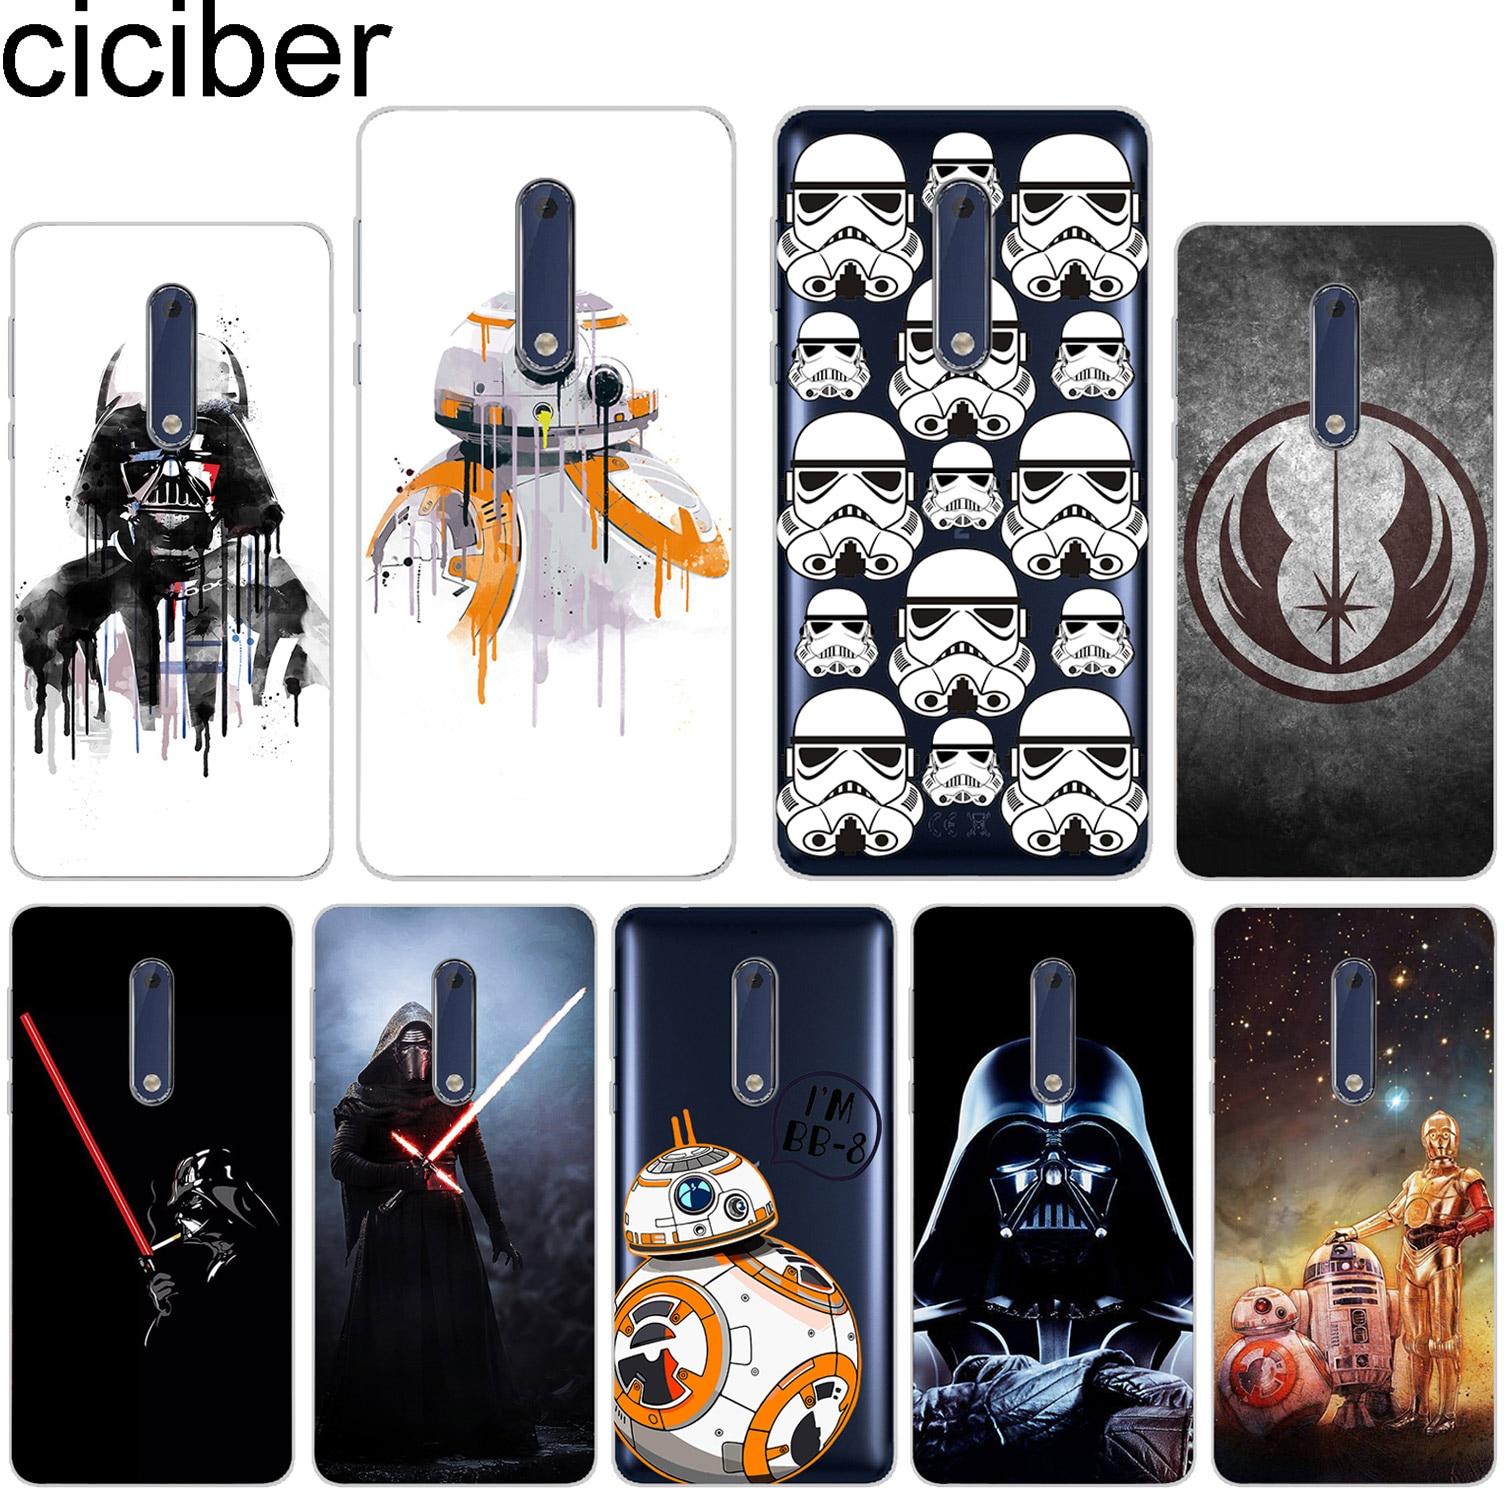 ciciber For Nokia 8 7 7.1 6 6.1 5 5.1 3 3.1 2 2.1 1 Plus Soft Silicone PhoneCase TPU For Nokia X7 X6 X5 X3 BB8 Star Wars Cartoon